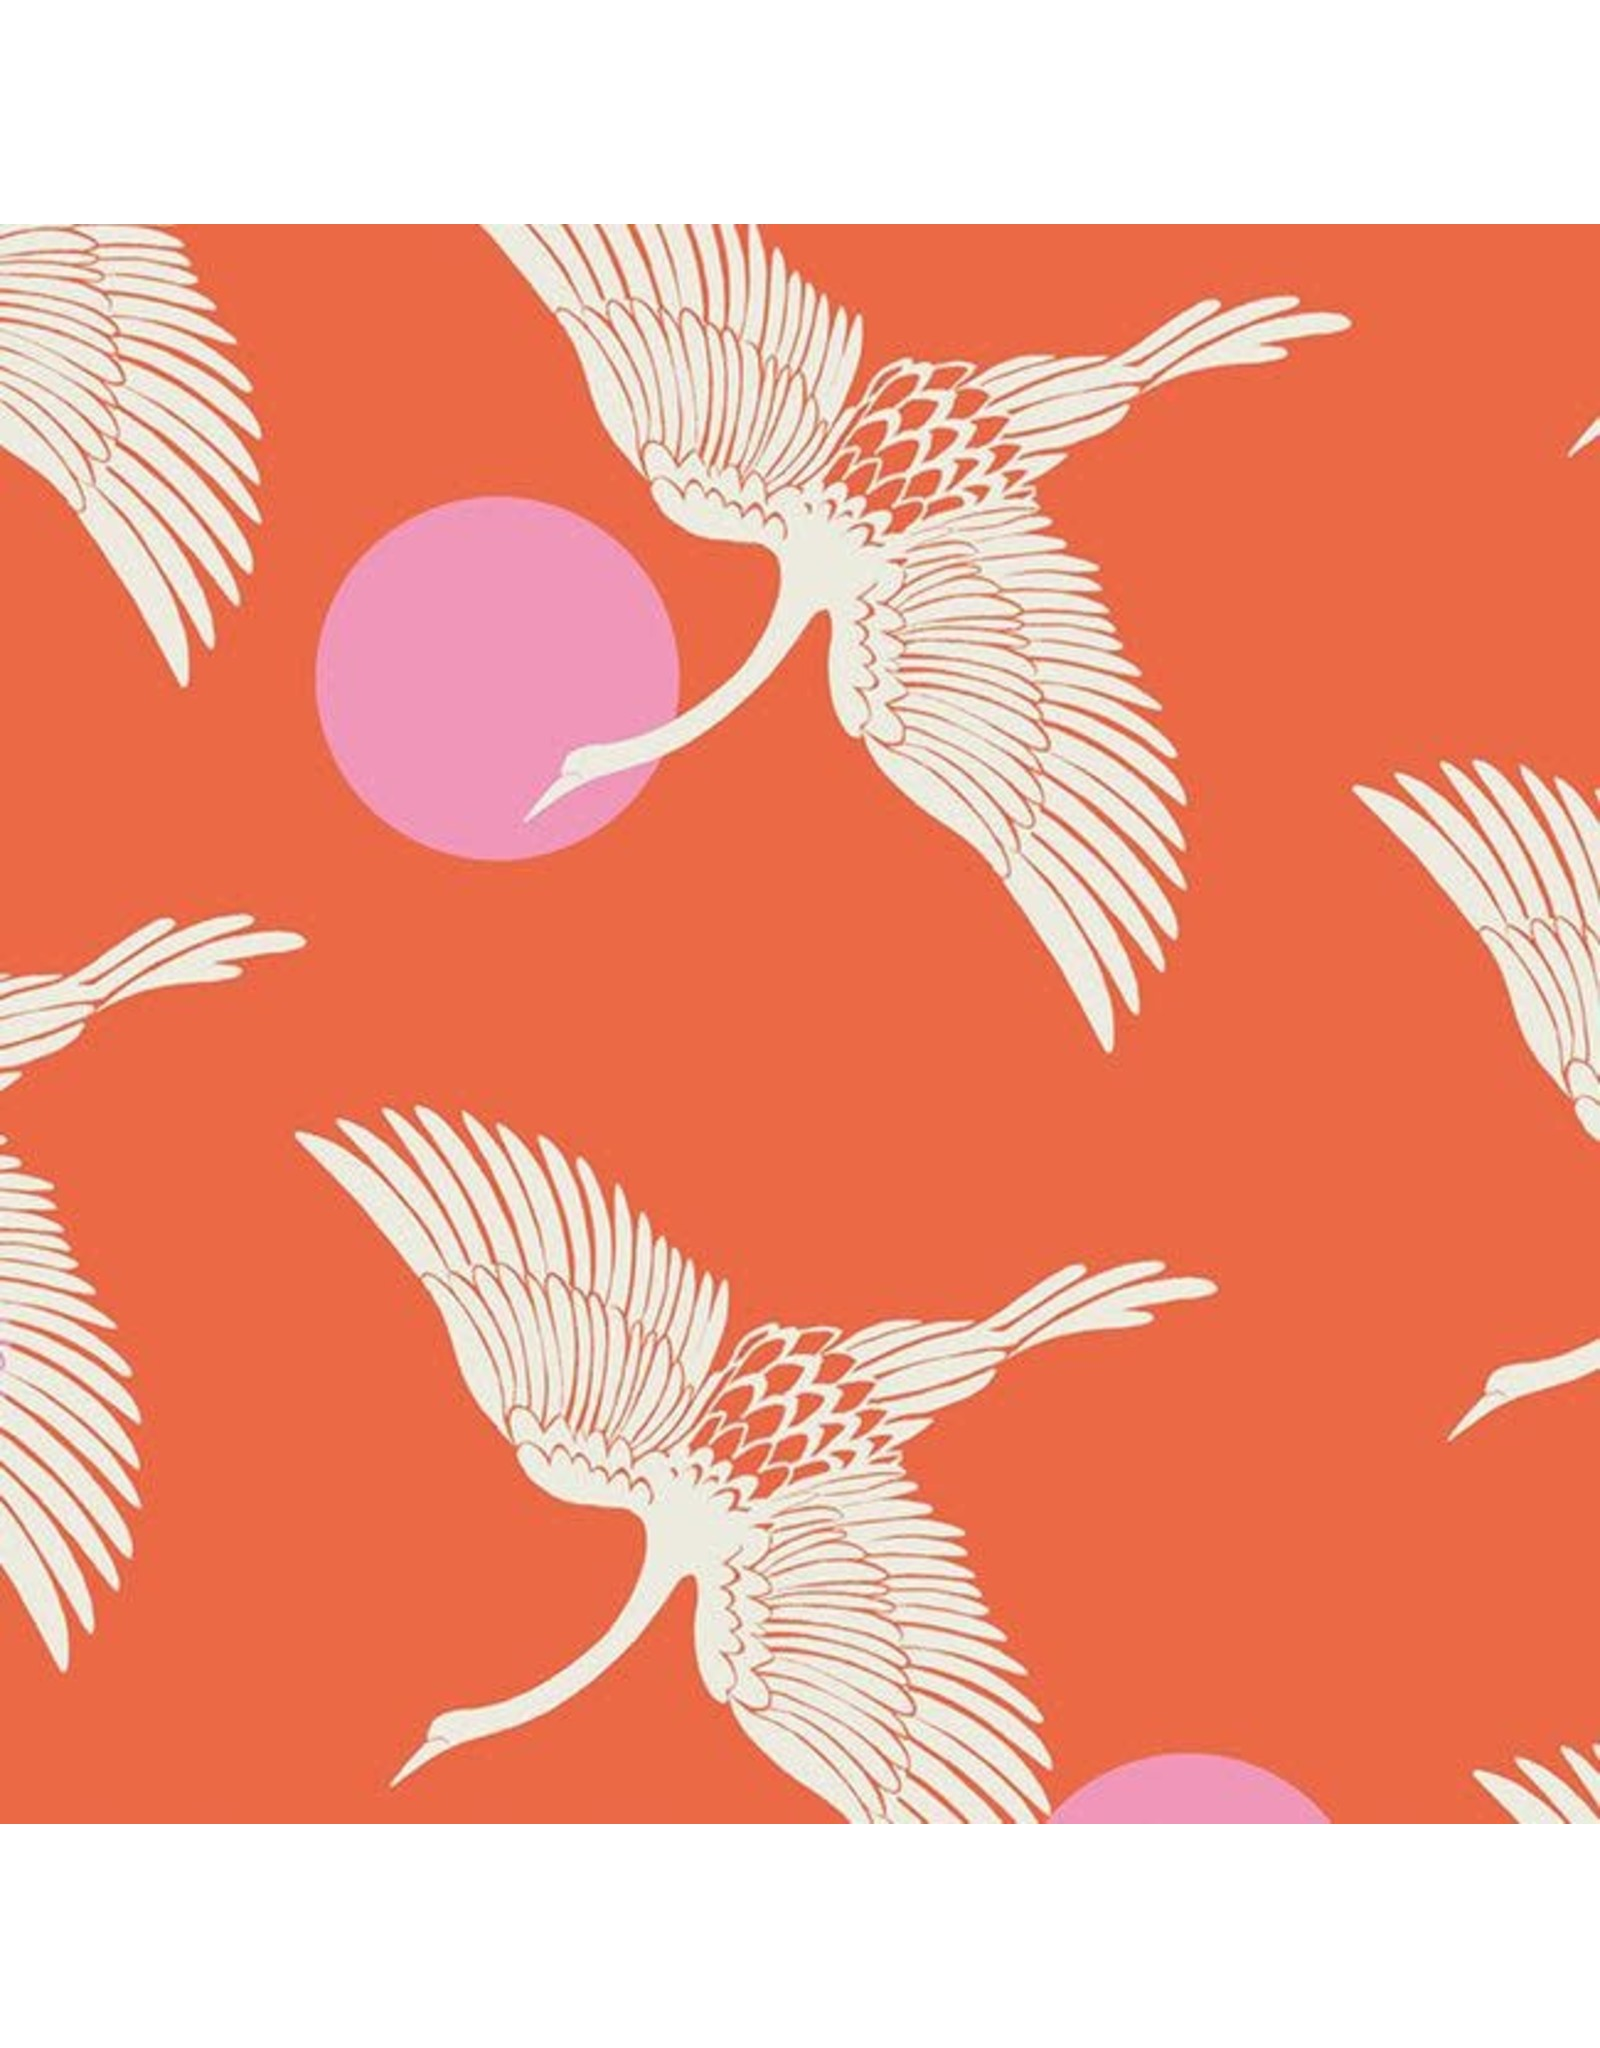 Sarah Watts Ruby Star Society, Florida, Egrets in Fire, Fabric Half-Yards RS2023 11